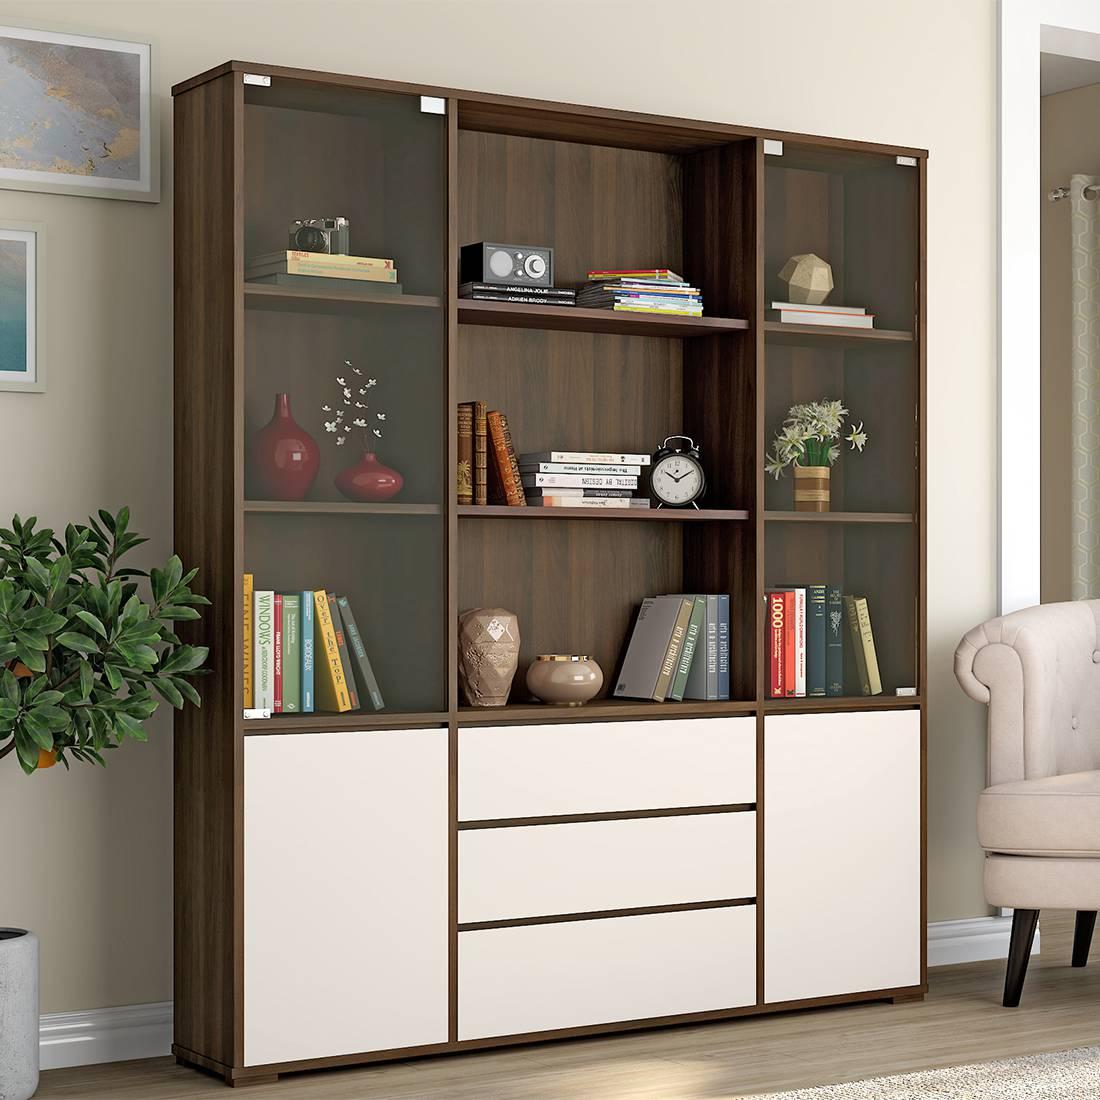 Showcase Design: Buy Showcase Furniture Online at Best Prices